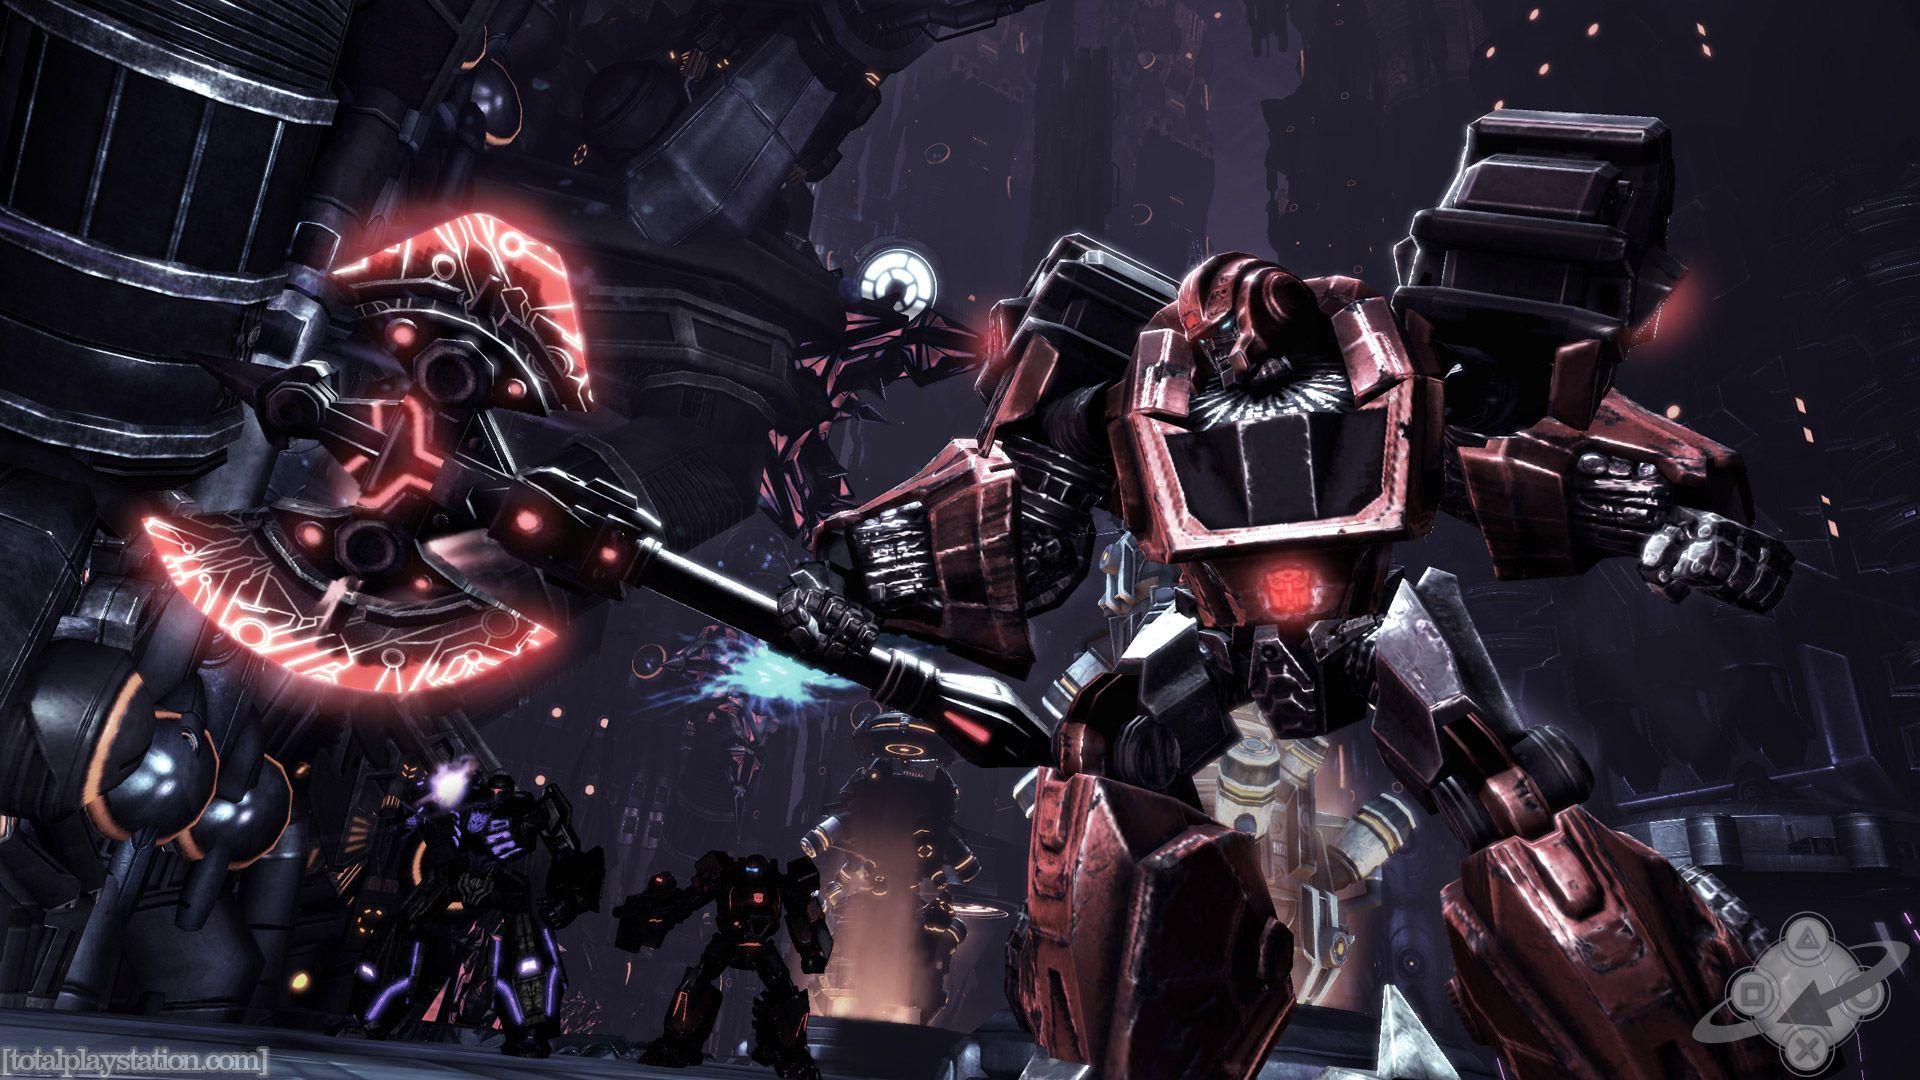 Transformers Fall Of Cybertron Wallpaper Cybertron Wallpapers Wallpaper Cave